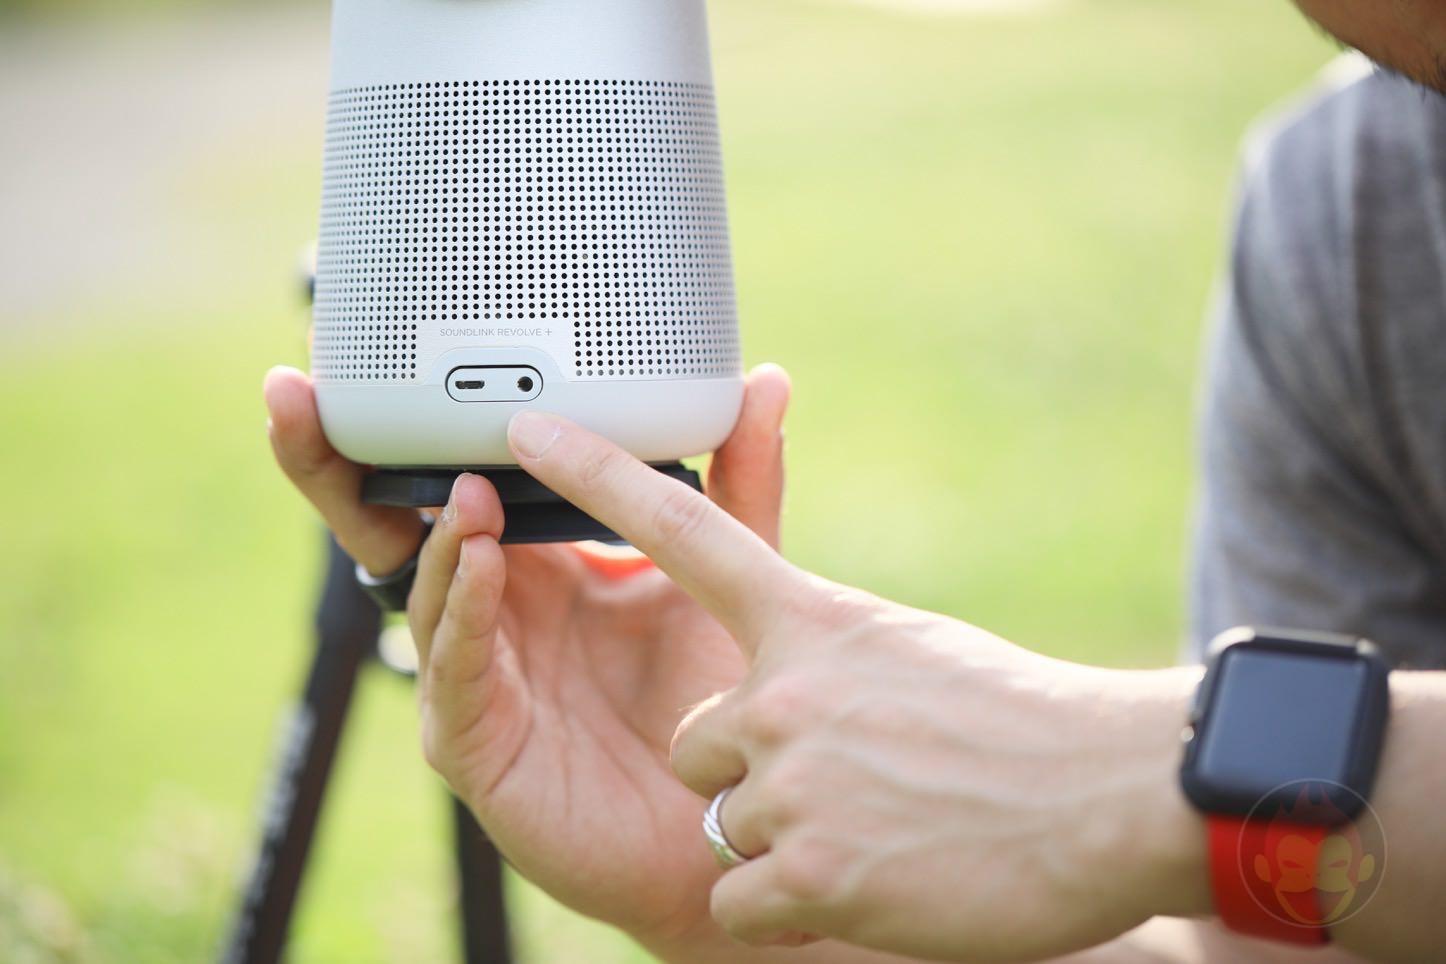 Bose-SoundLink-Revolve-05.jpg